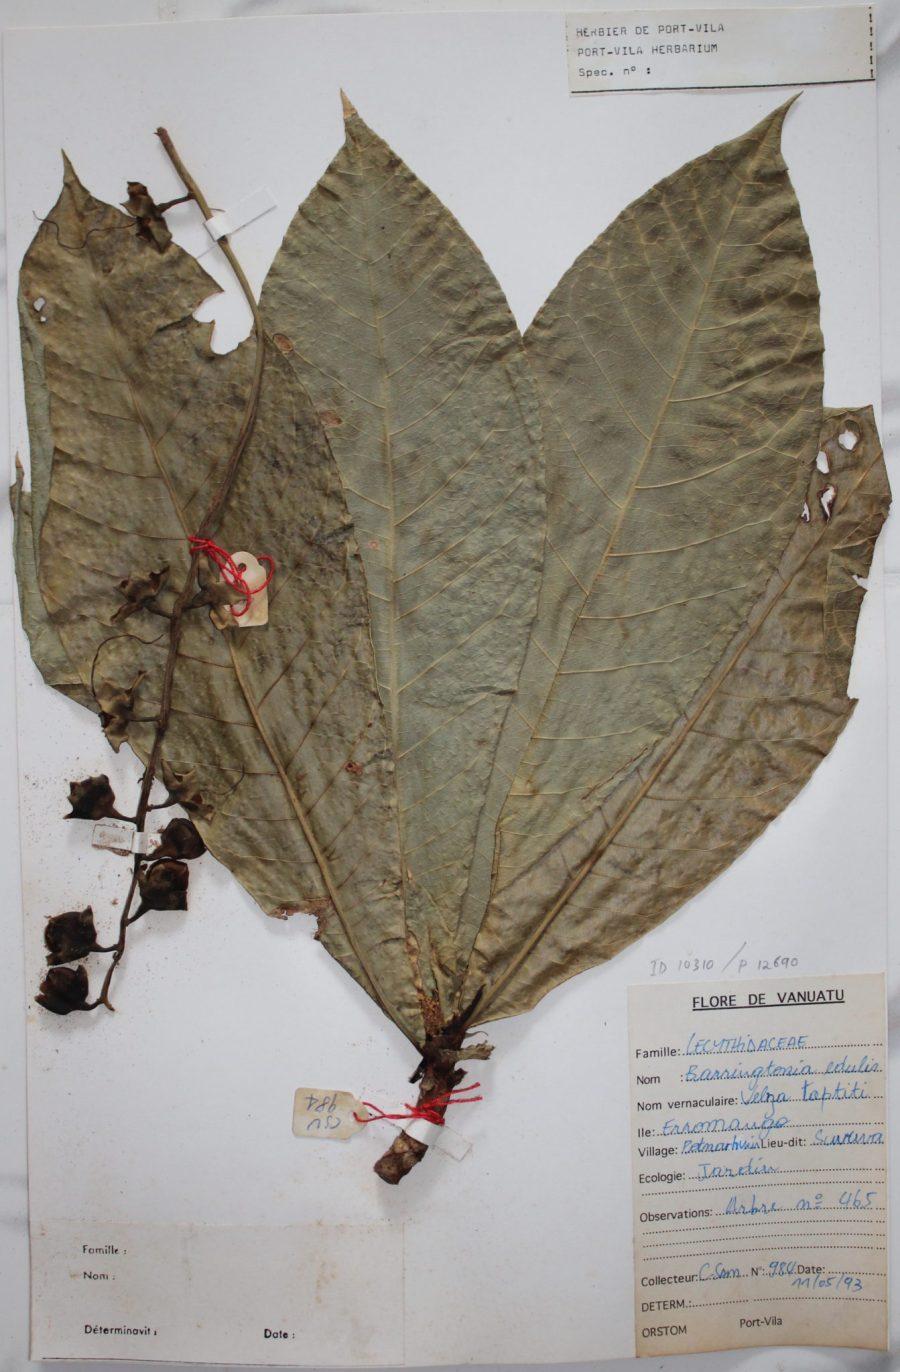 A herberium specimin of Barringtonia edulis, or cutnut, which remains an important food in Vanuatu diets. Monica Tromp